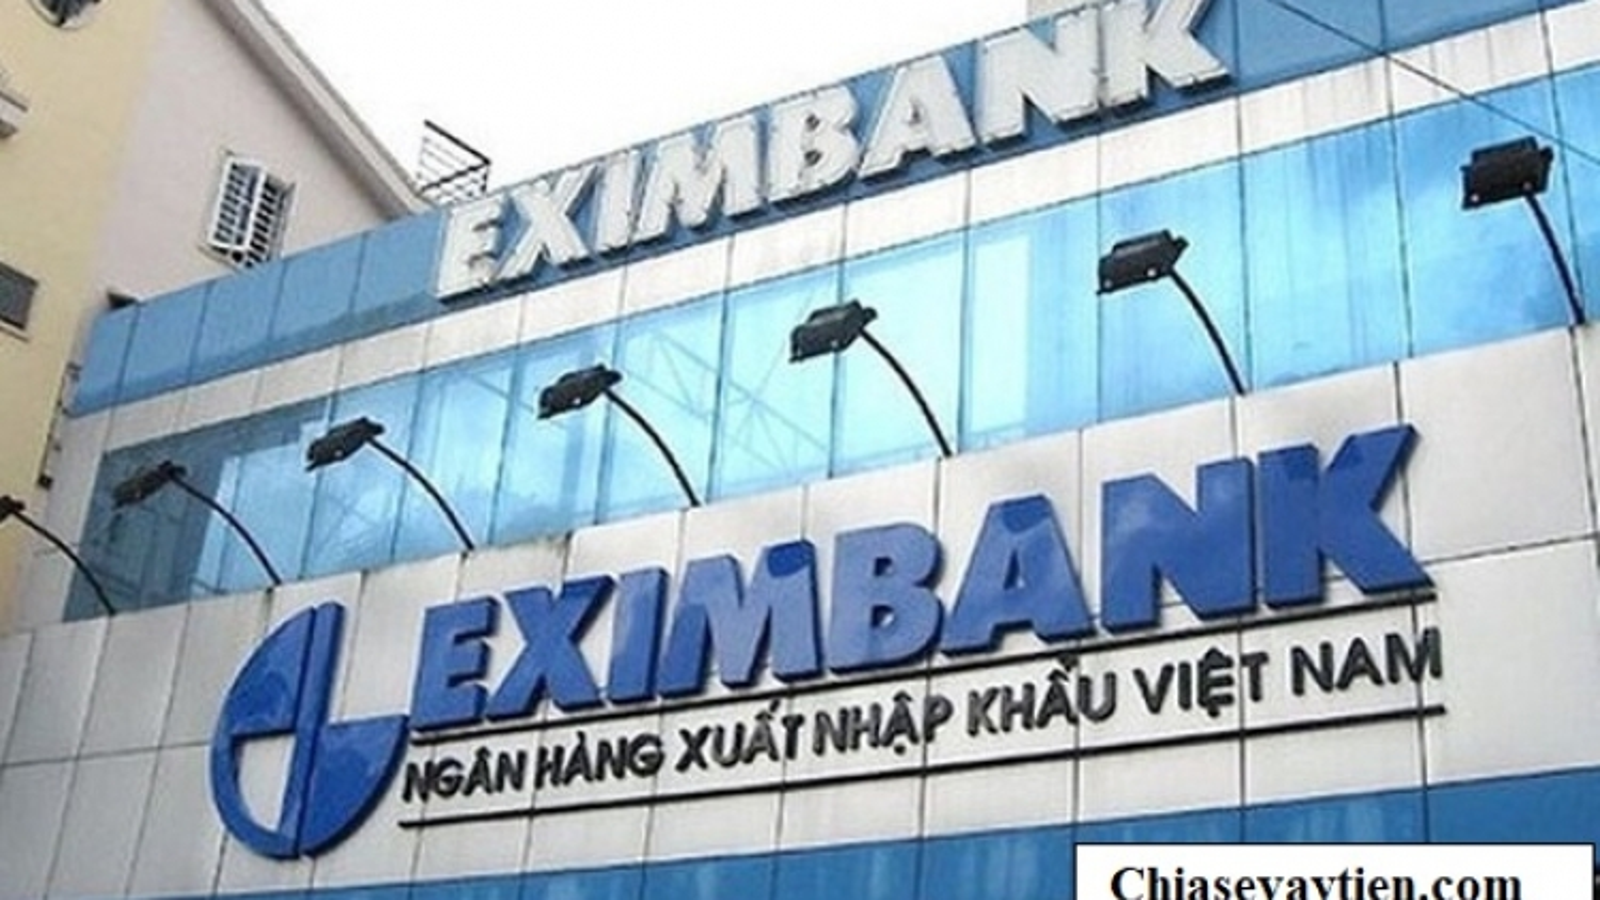 Chuyện gì đang xảy ra ở Eximbank?